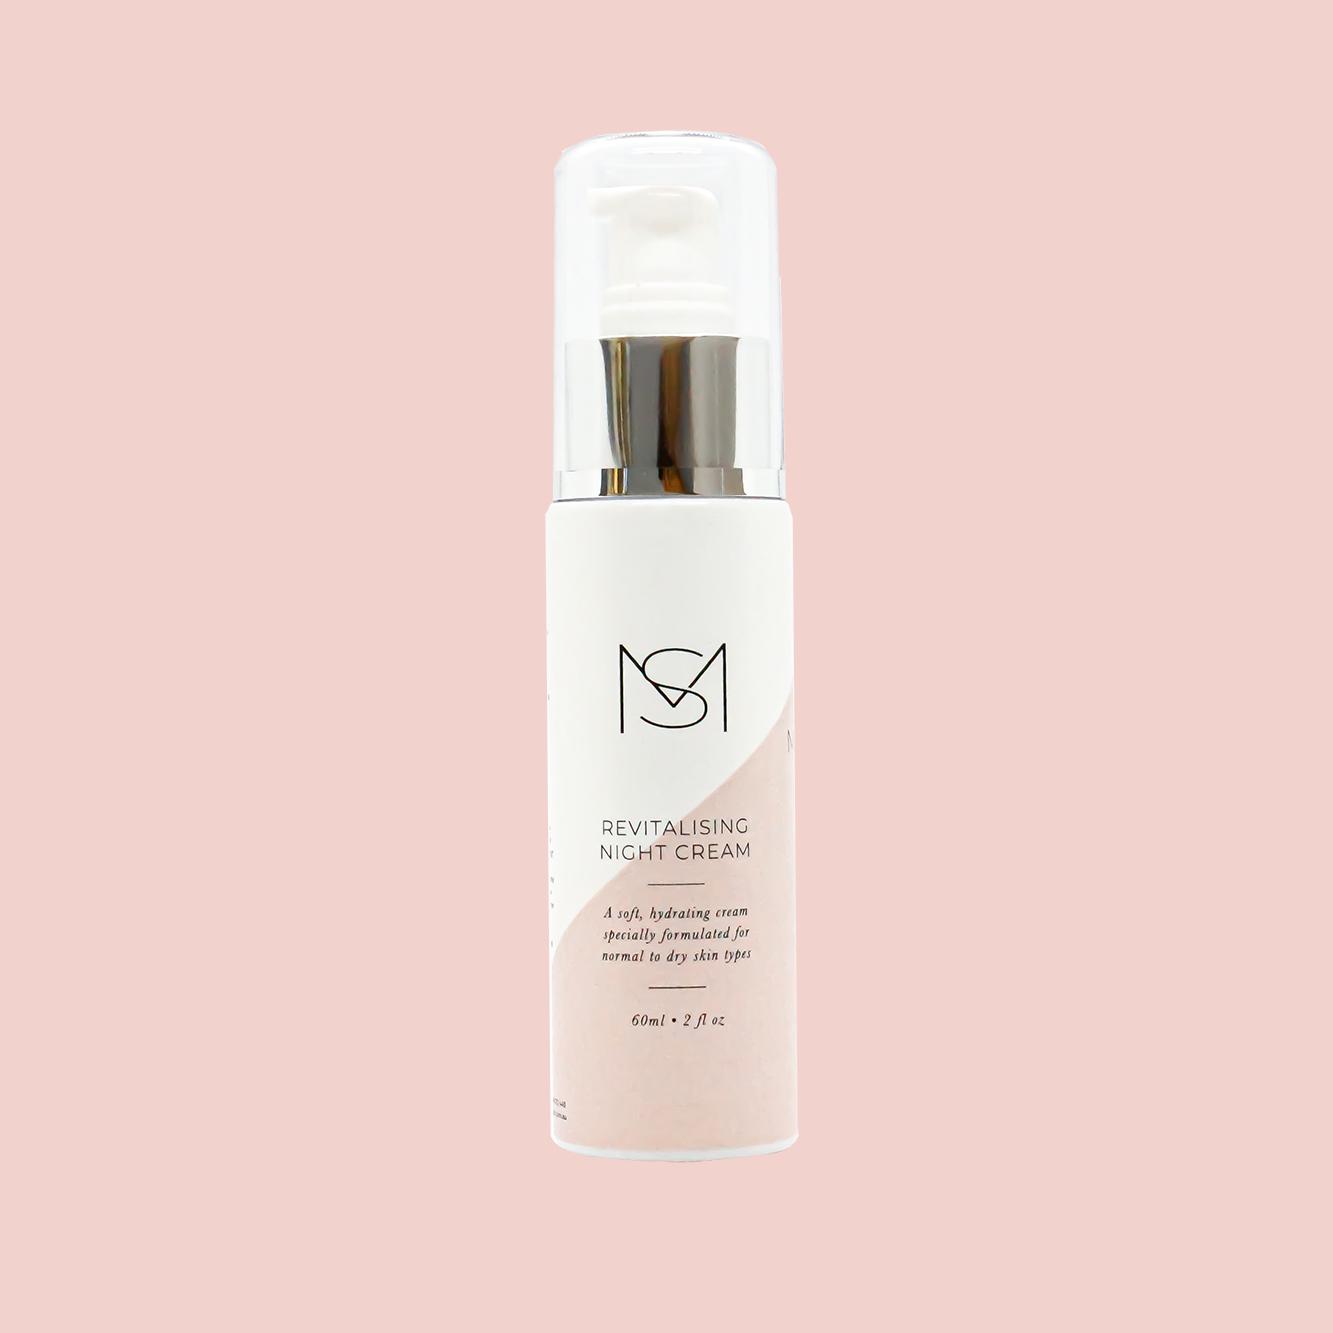 Revitalising Night Cream 60mL - Australian made skincare by Mariella Skin Perth 01